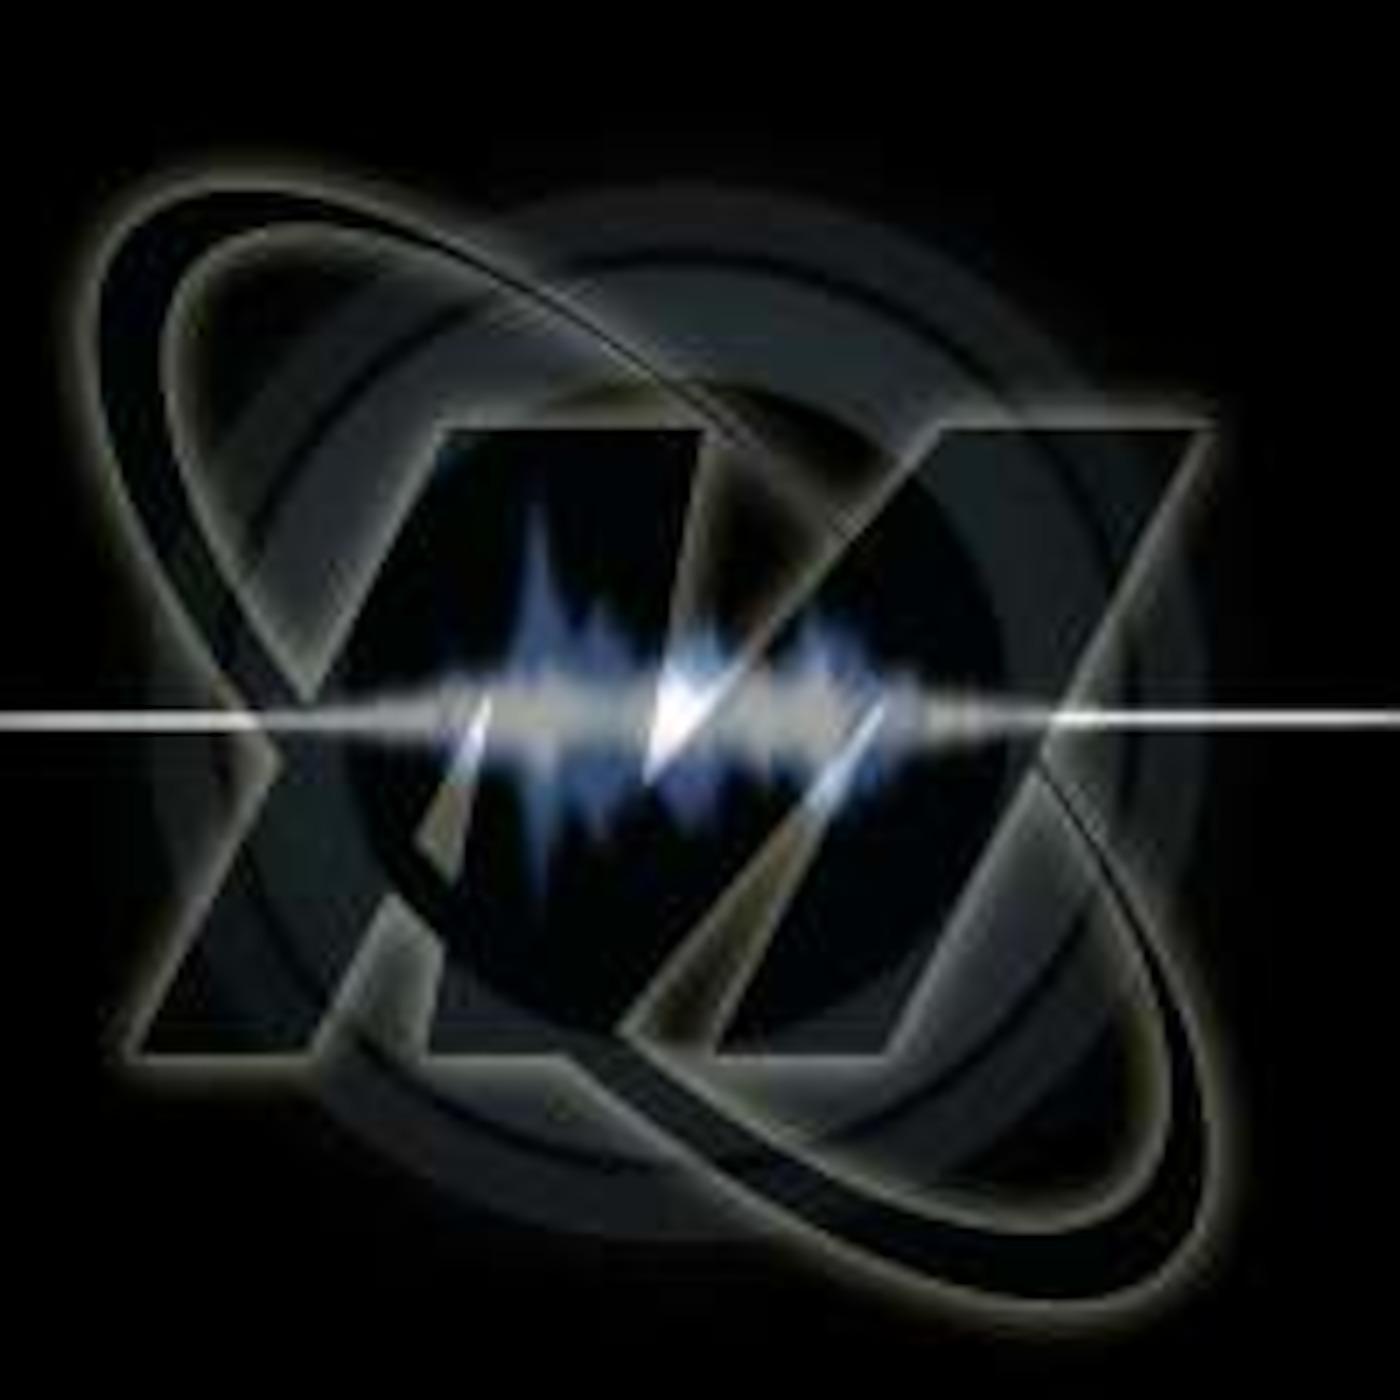 Dj Melkweg Tranceportation Mix Podcast